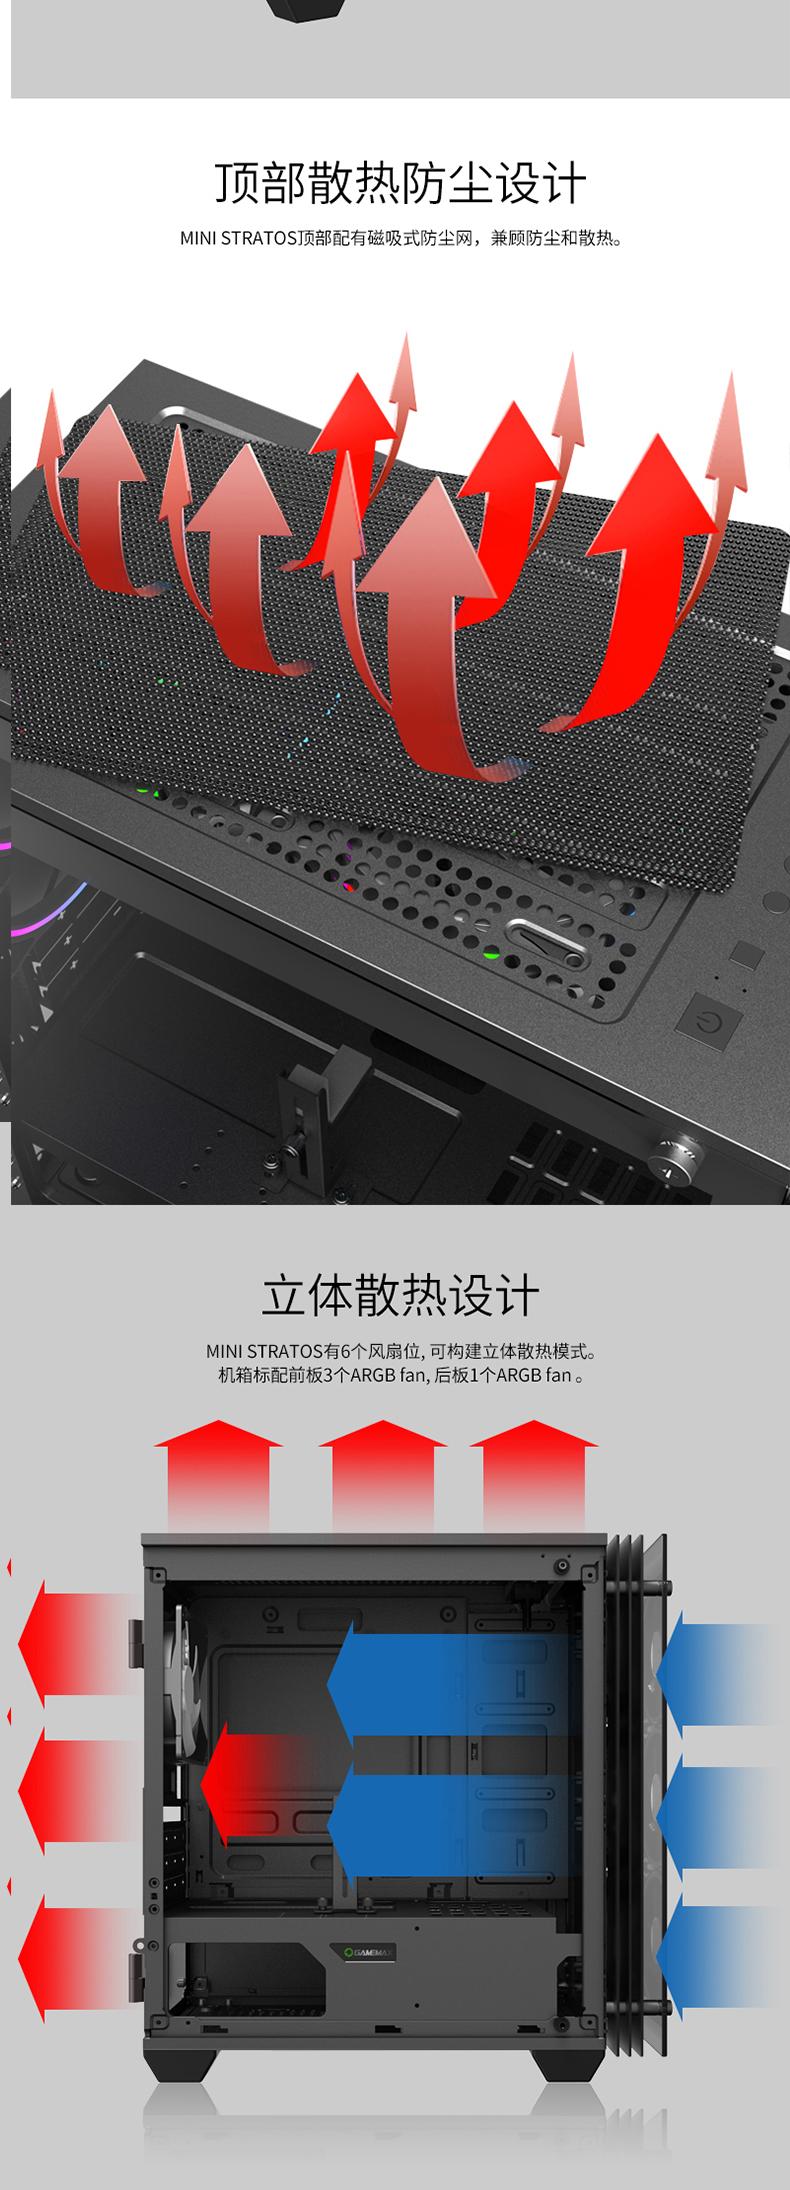 GAMEMAX_MINI-STRATOS-H609详情页中文_08.jpg